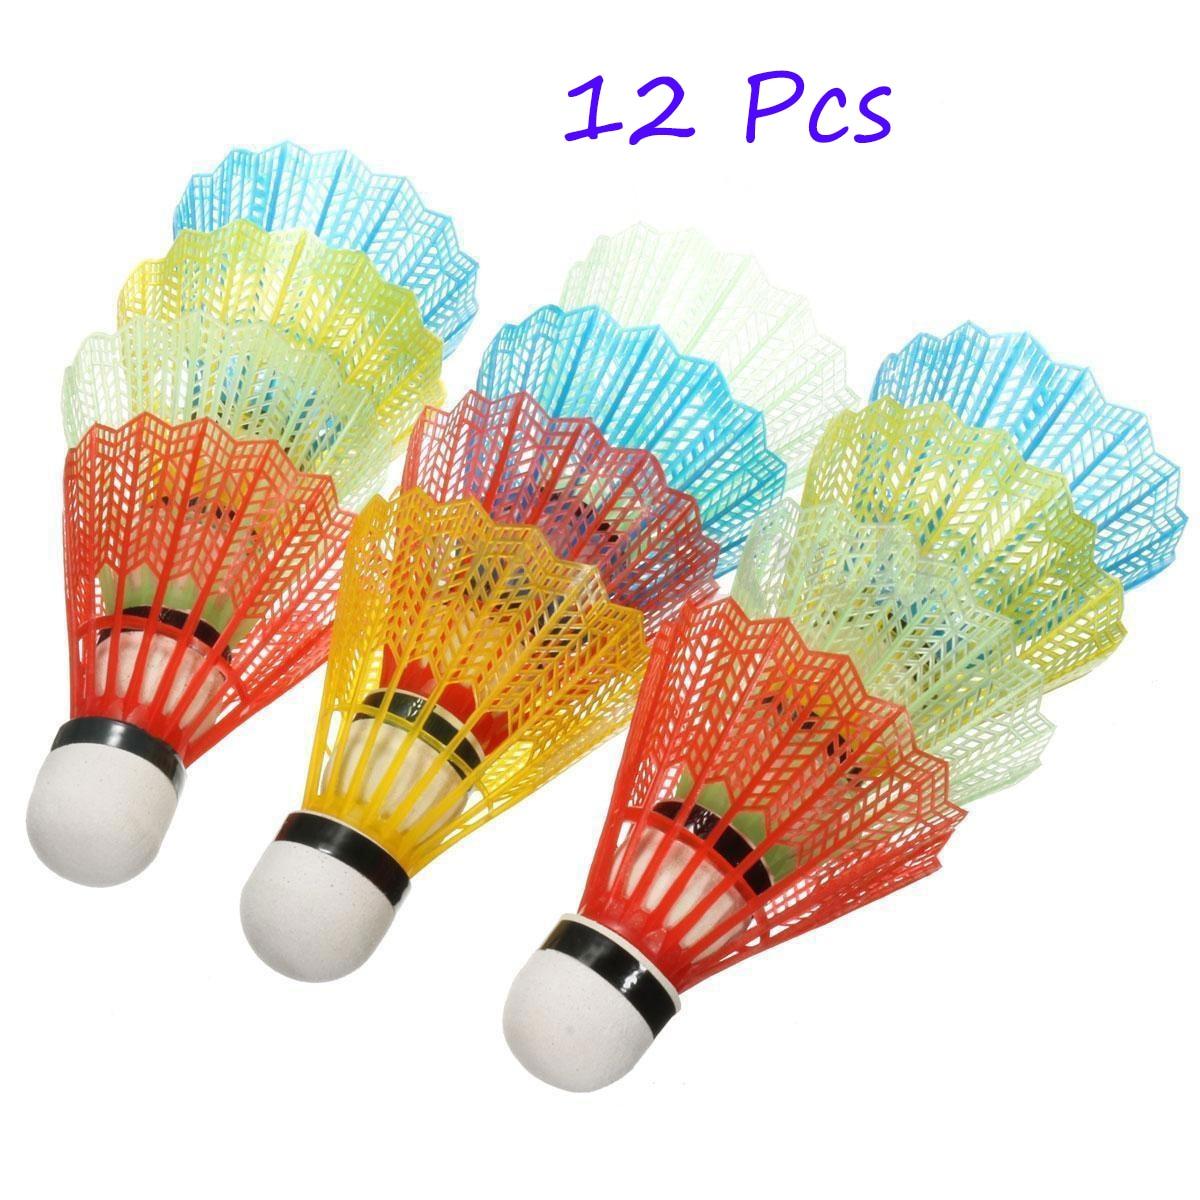 12pcs Colorful Badminton Balls Portable Shuttlecocks Products Sport Training Train Outdoor Supplies